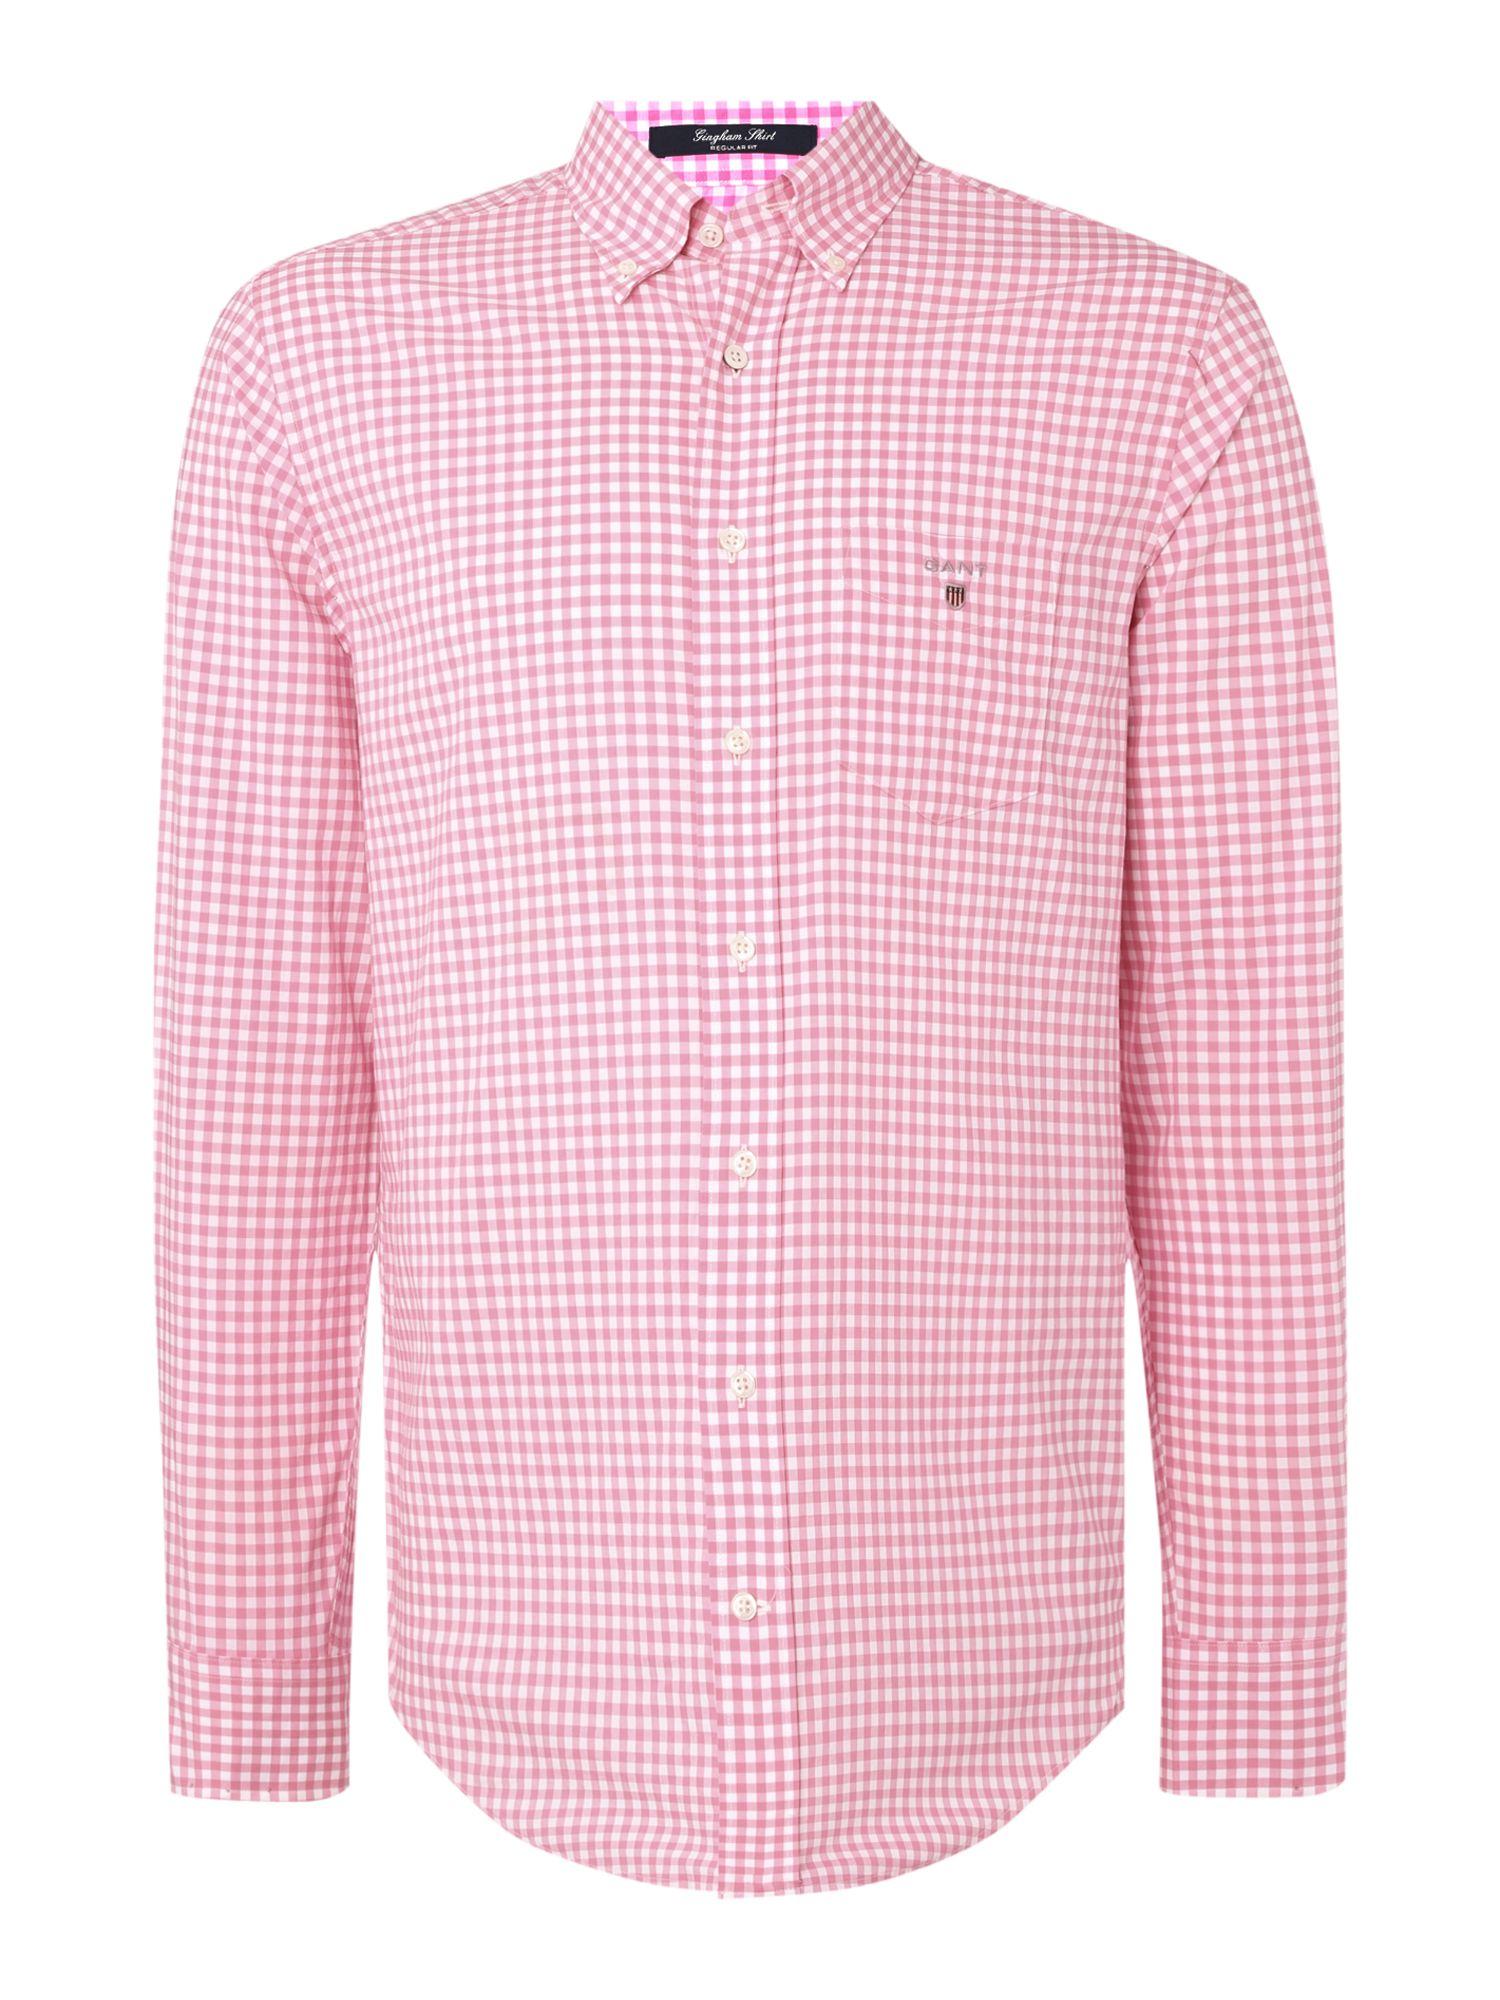 New Men's Shirts Regular Fit Shirts Slim Fit Shirts Fitted Shirts Super Fitted Shirts Tuxedo Shirts Non-Iron Shirts Stretch Shirts White Shirts SHIRTS. Shirts Regular Fit Shirts Non-Iron Light Pink Gingham Regular Fit Shirt. Images. Non-Iron Light Pink Gingham Regular Fit Shirt. Details.